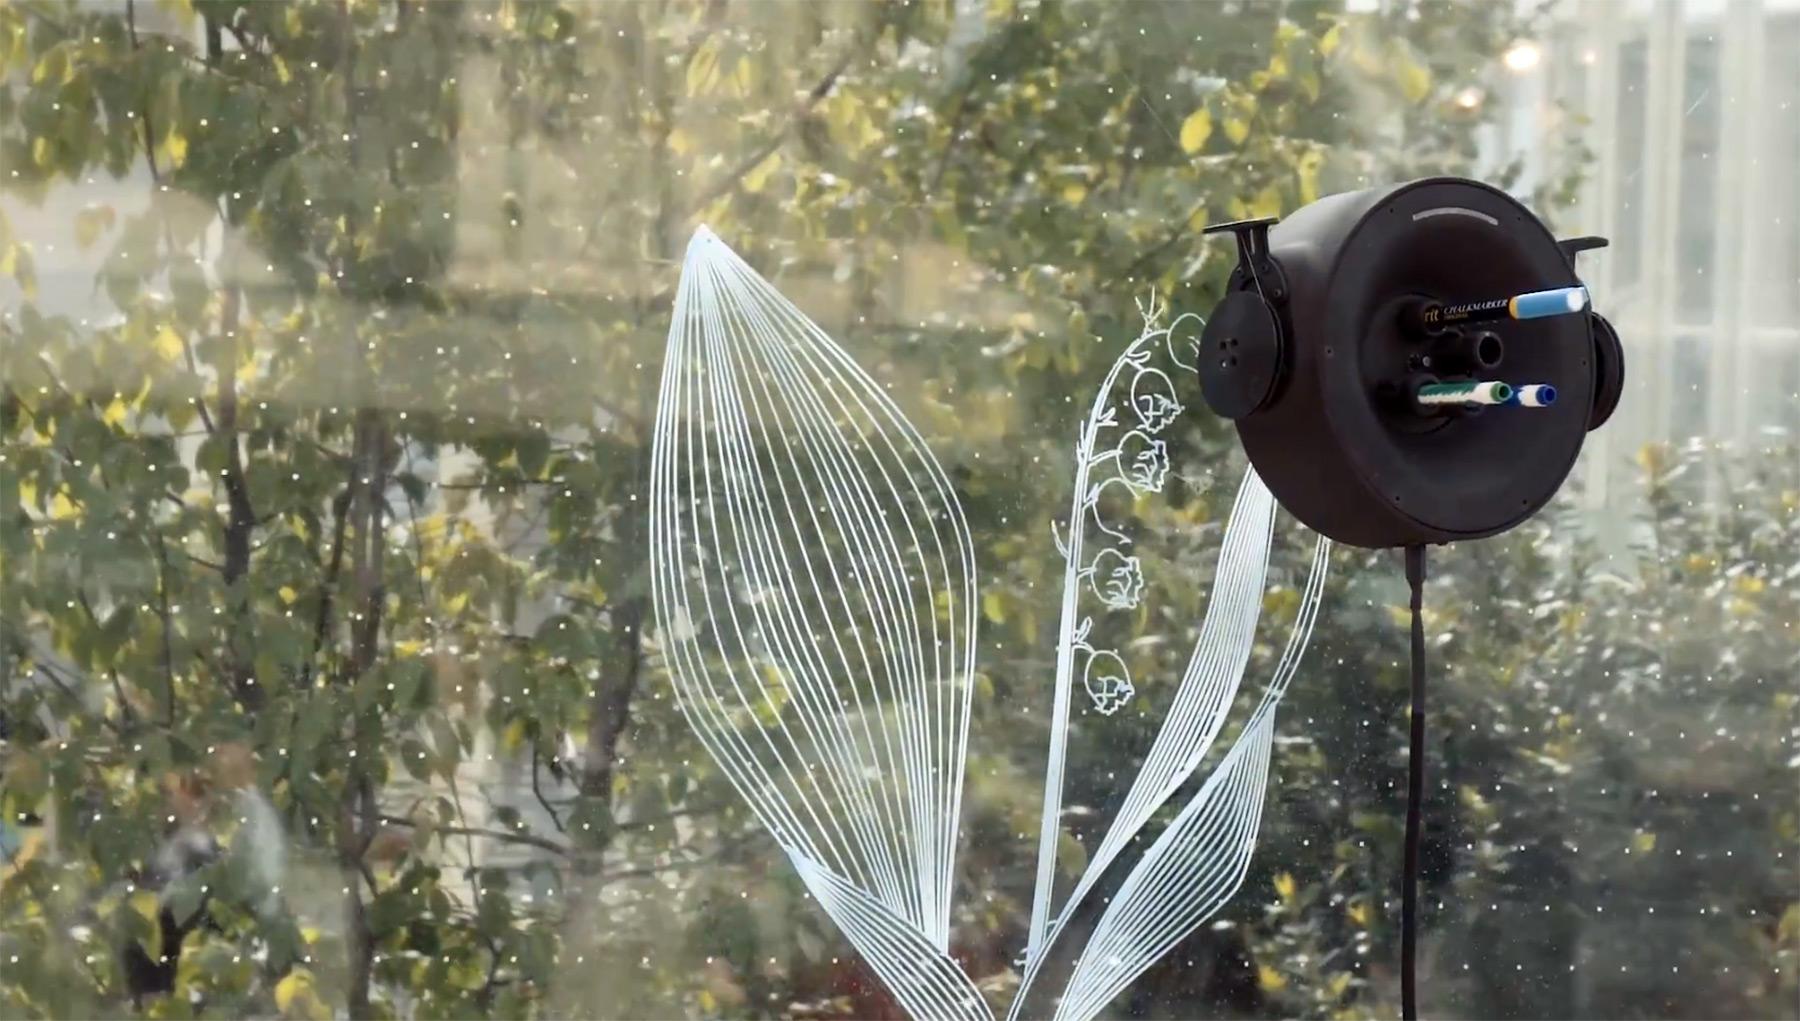 Scribit: Dieser Roboter bemalt Wände scribit-wandmalroboter